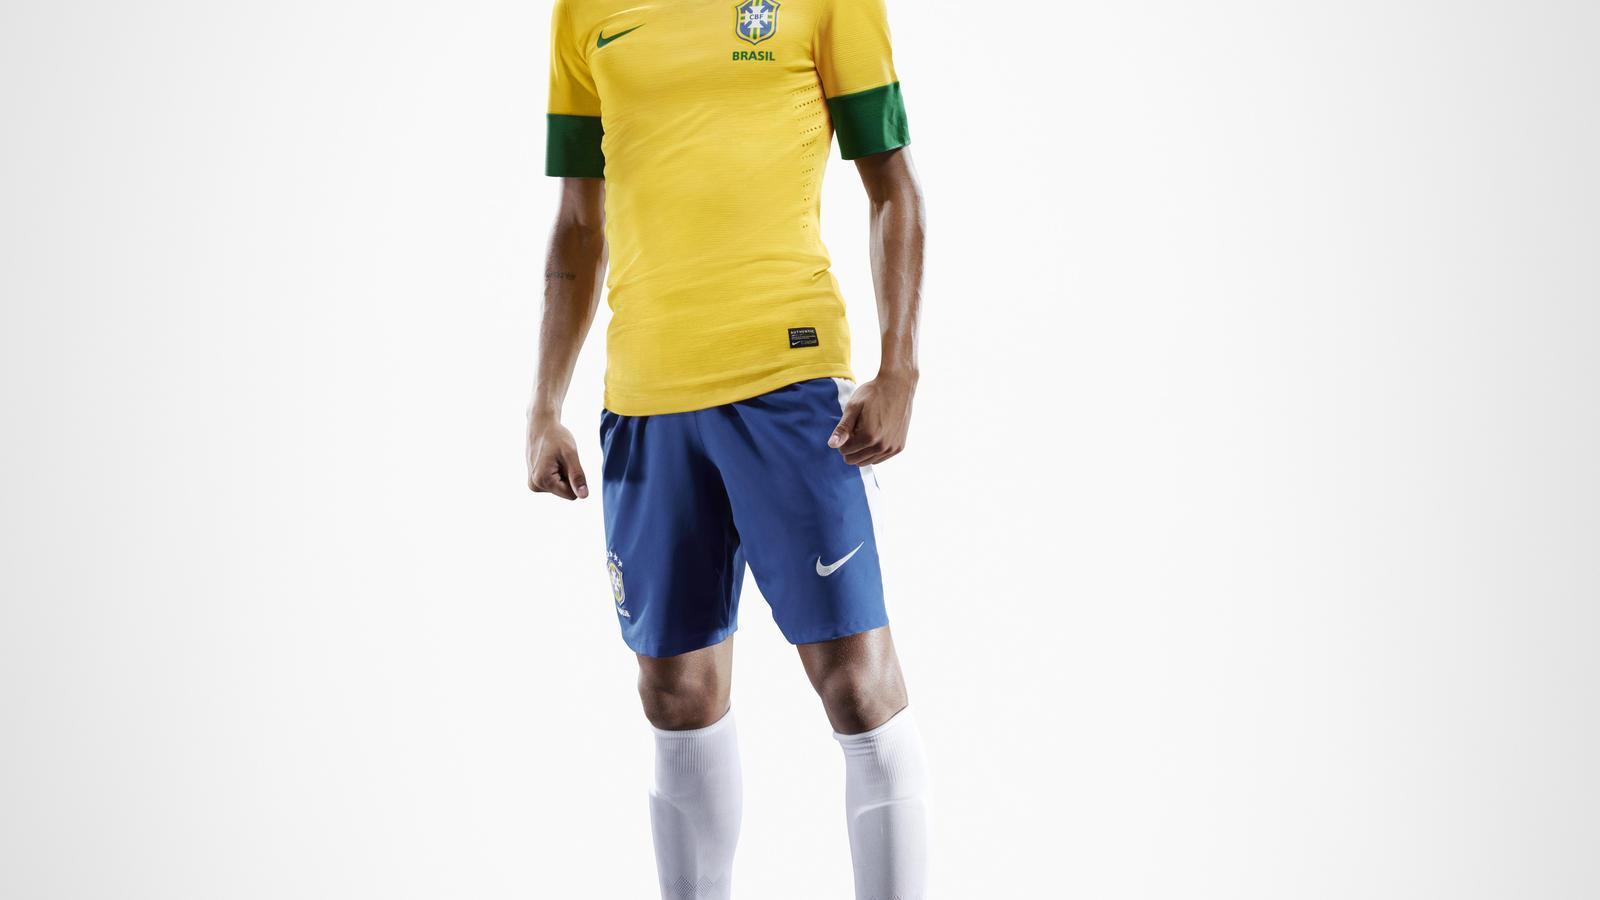 EC12_brazilian_uniform_Neymar